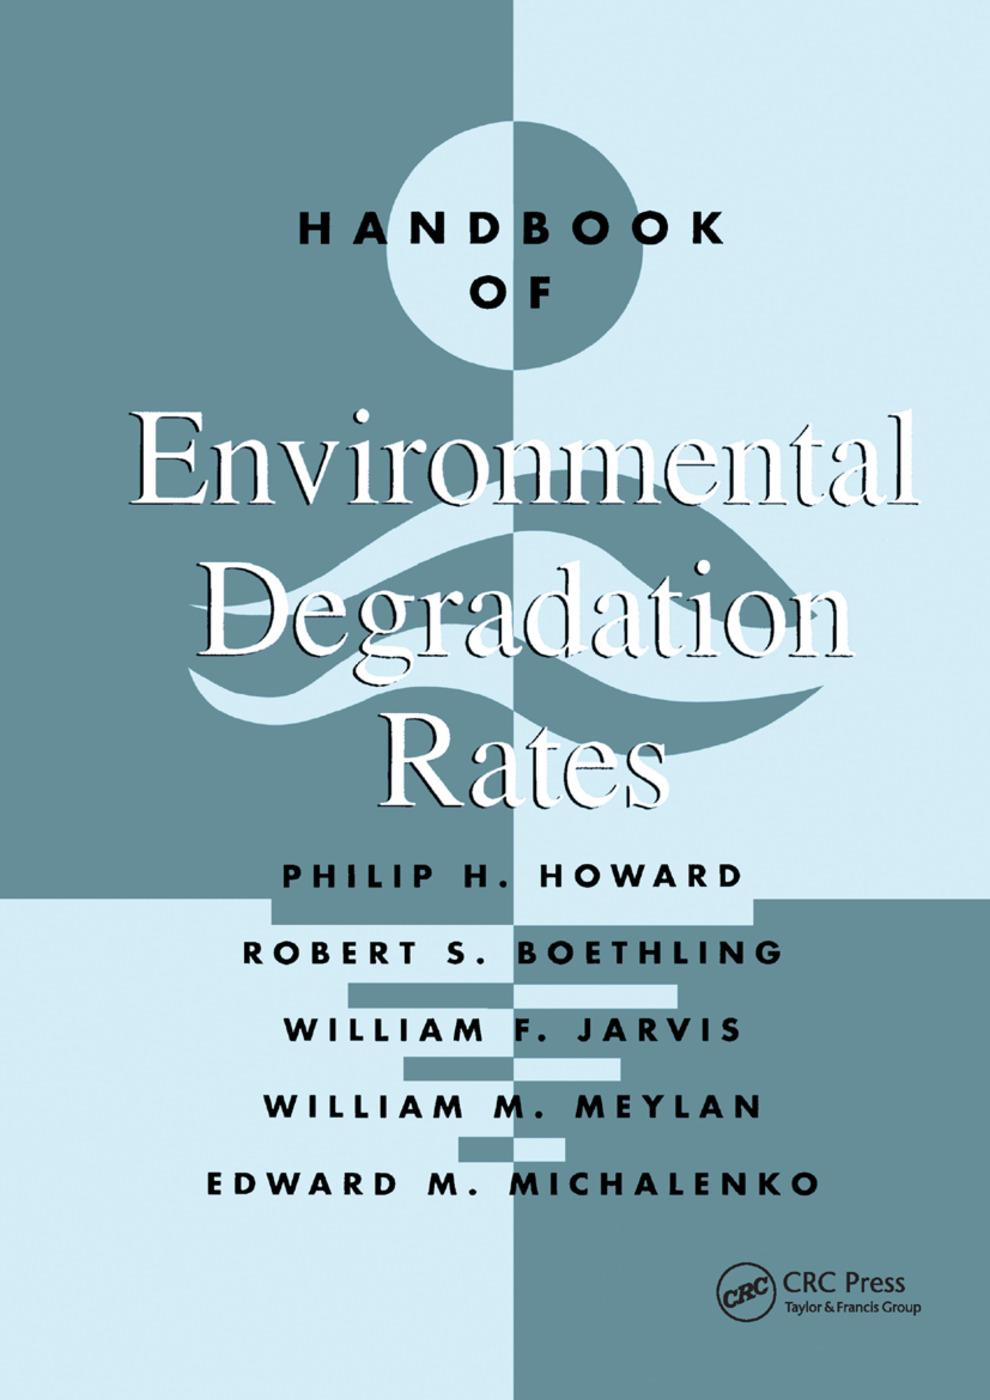 Handbook of Environmental Degradation Rates: 1st Edition (Paperback) book cover